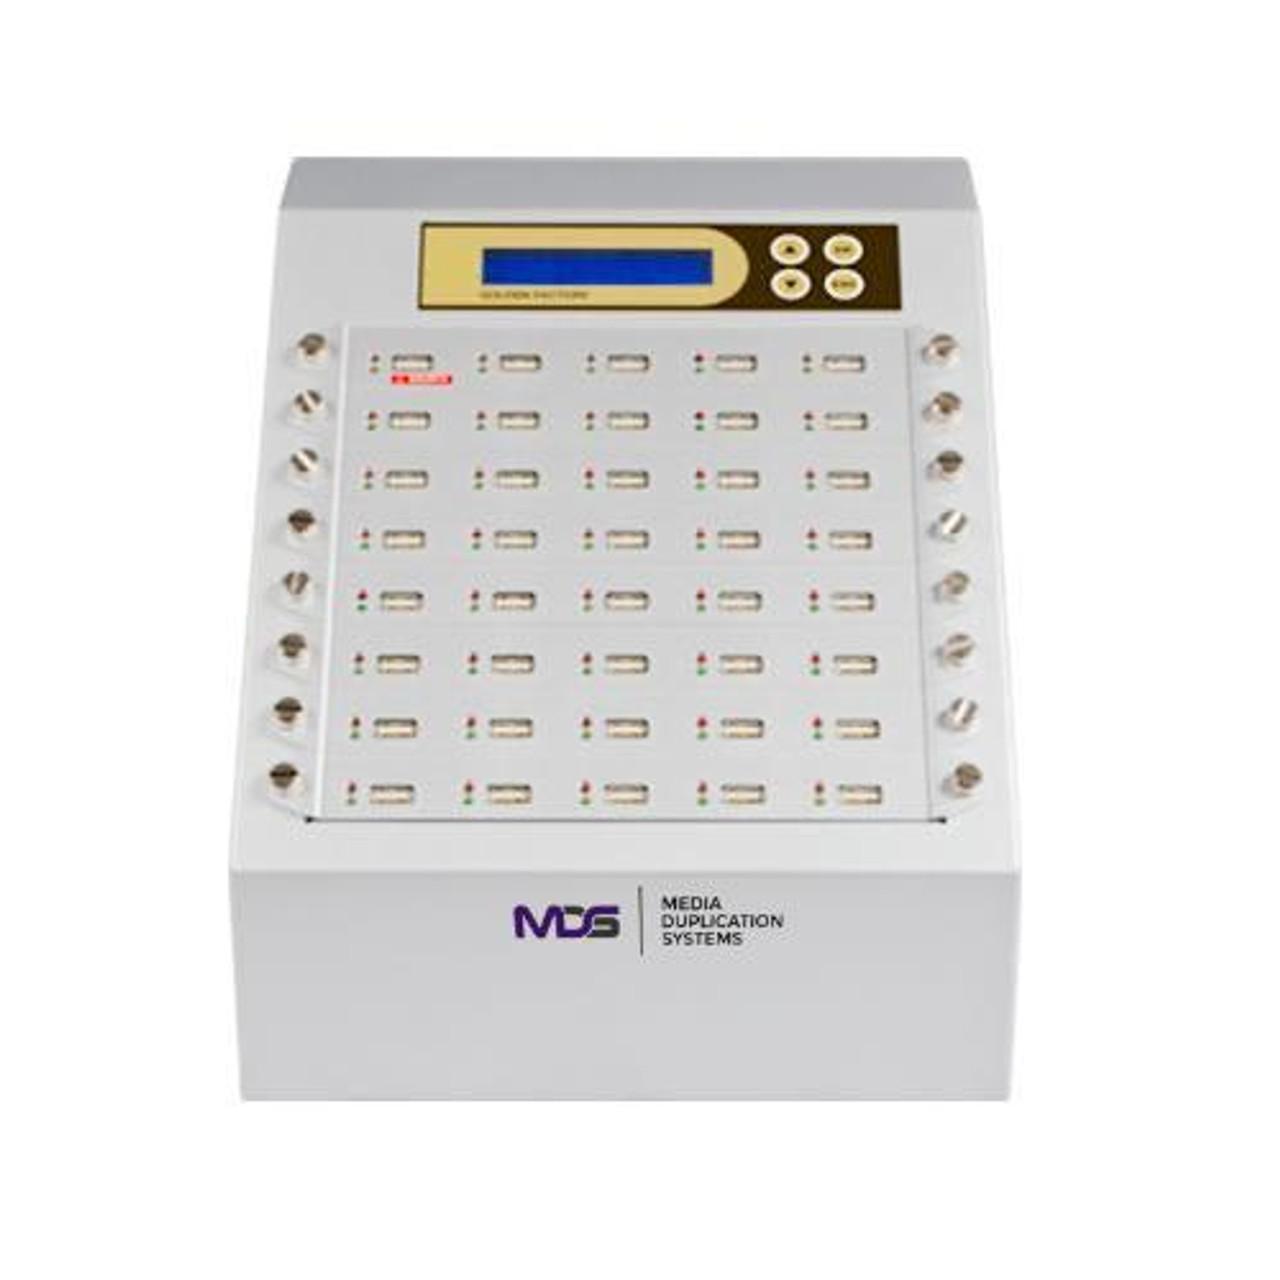 XpressHDD-Pro 1 to 39 External/Portable USB HDD/SSD Duplicator